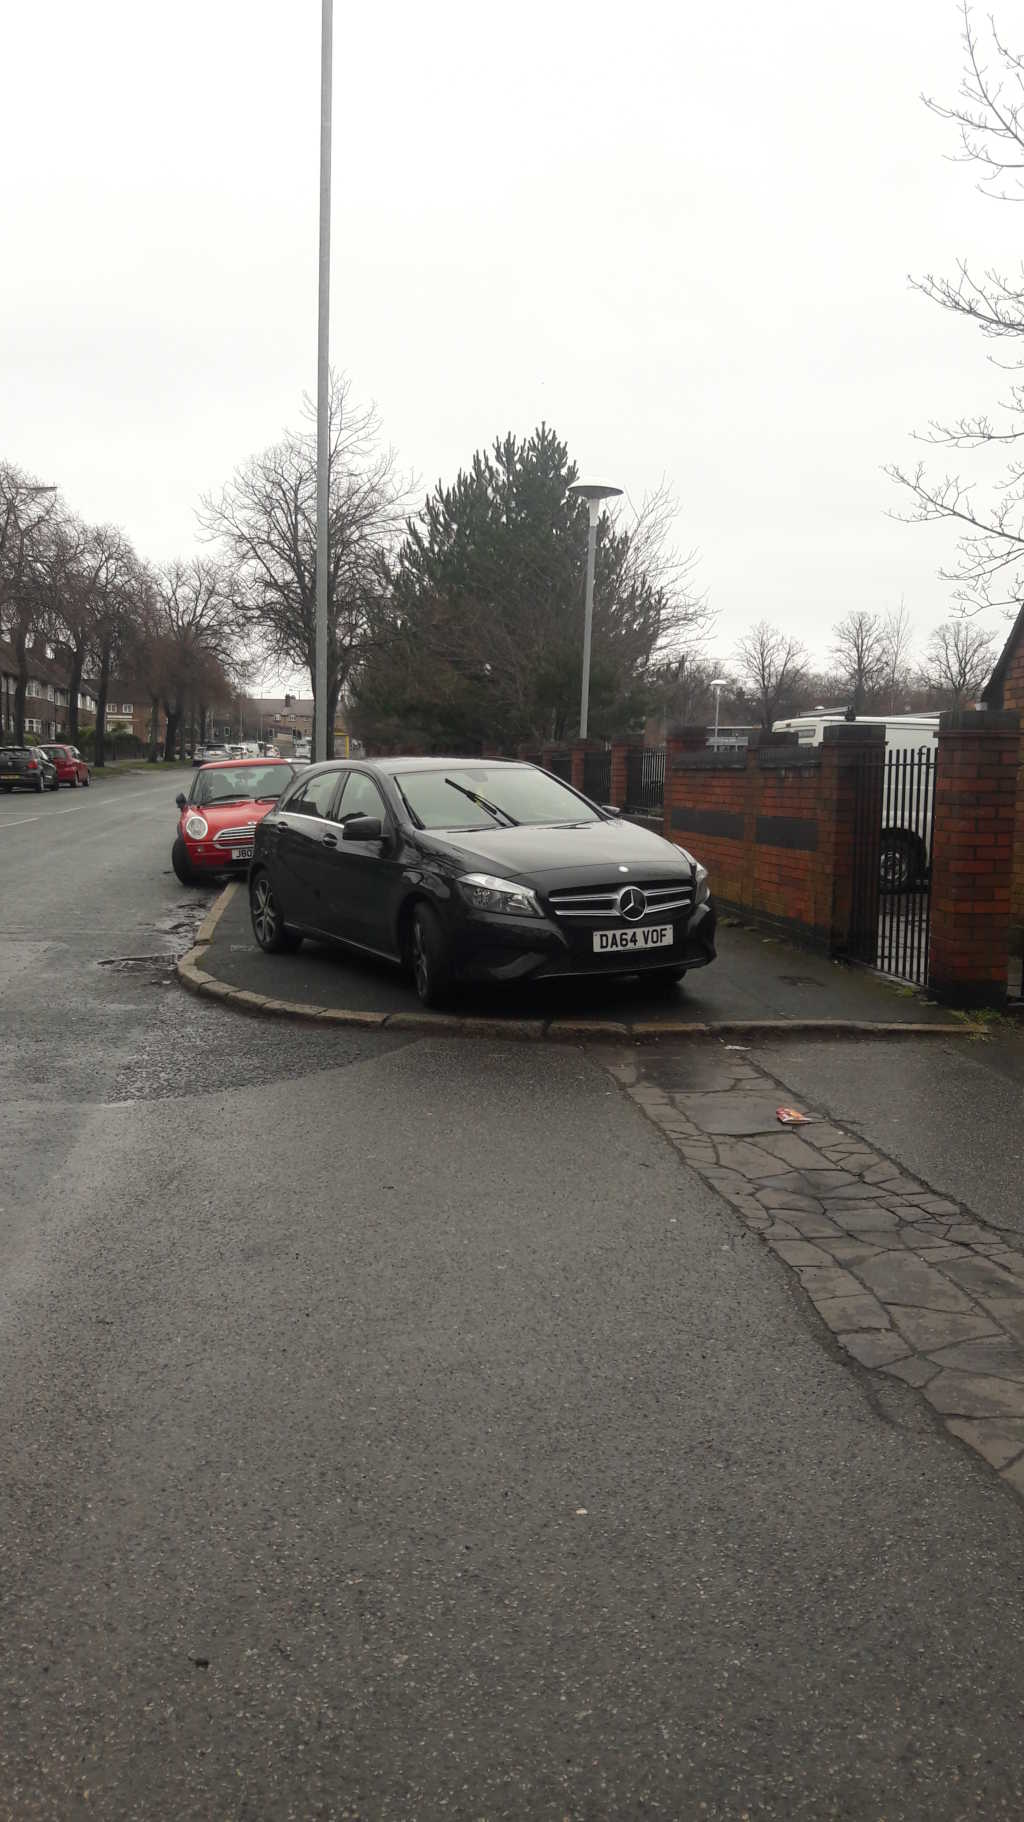 DA64 VOF displaying Inconsiderate Parking